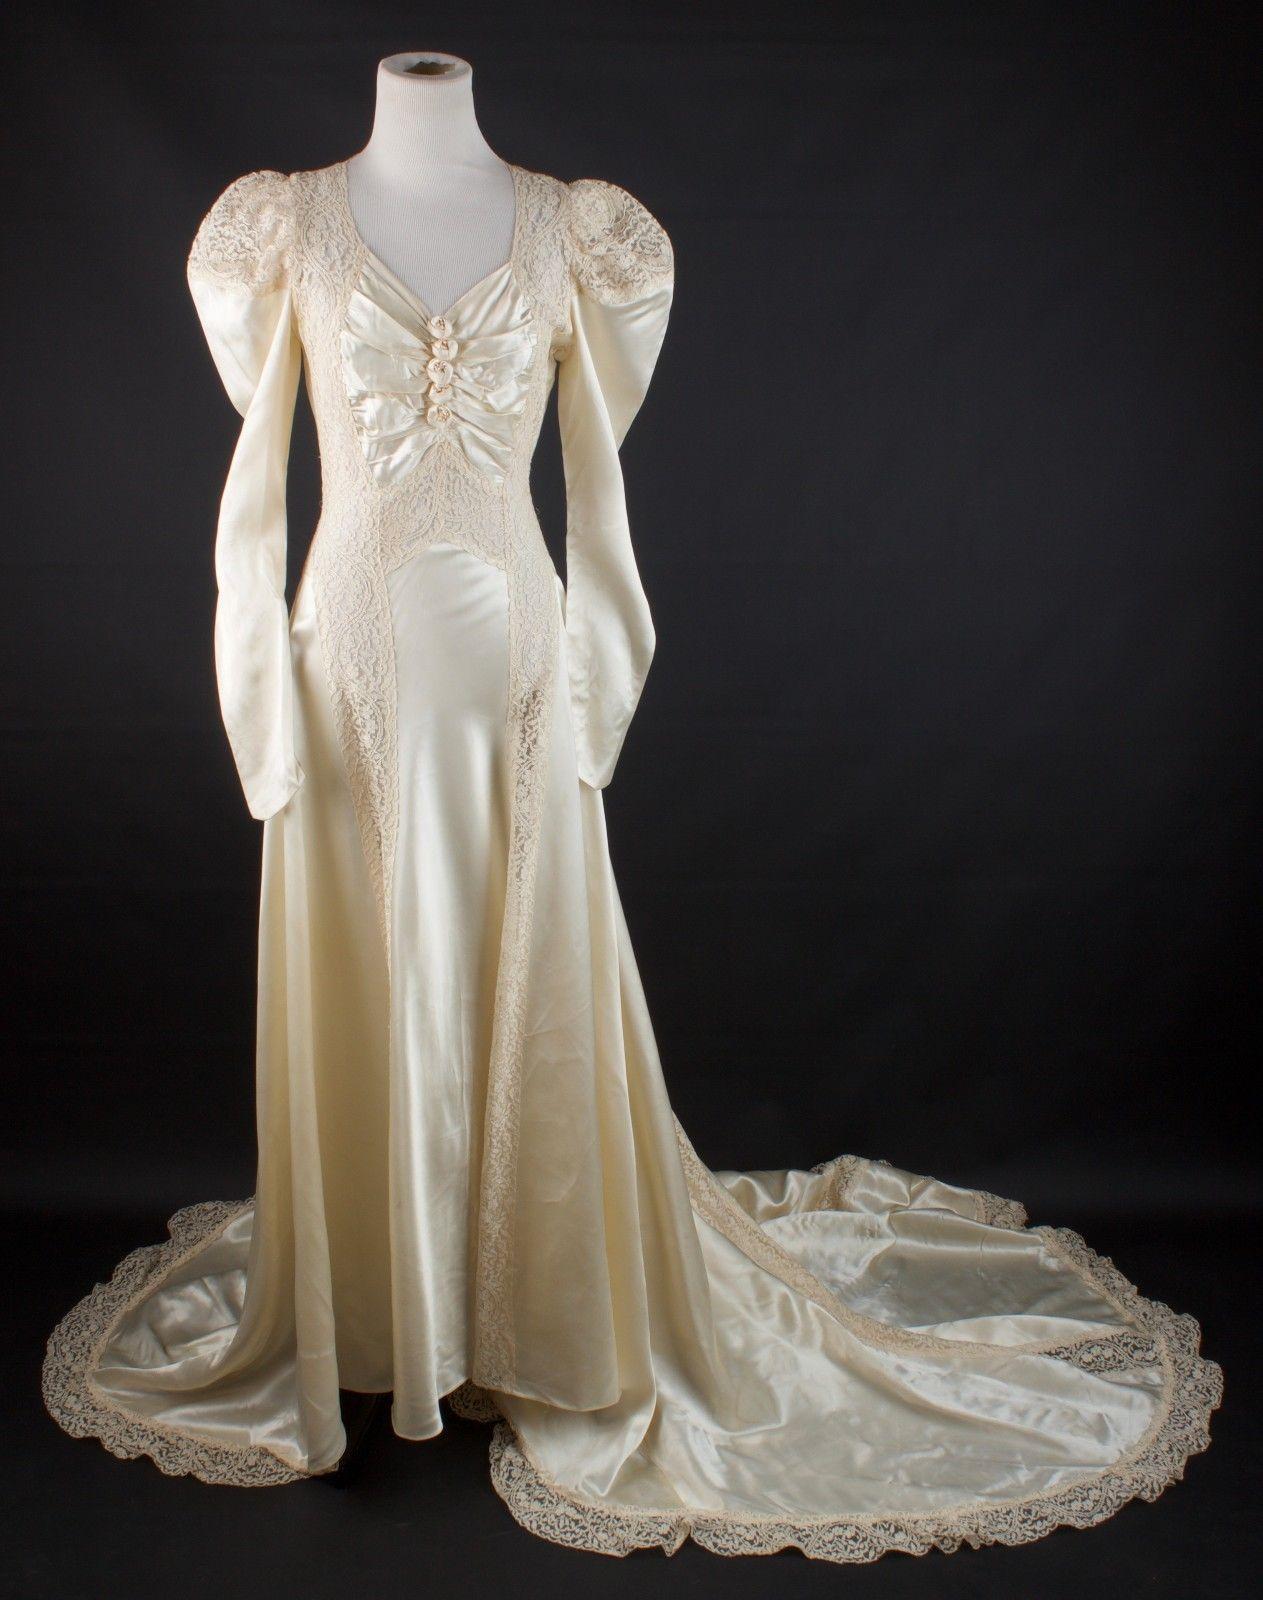 VTG 1930s XS/S AS-IS Cream Silk Wedding Dress w/ Open Lacework 30s ...